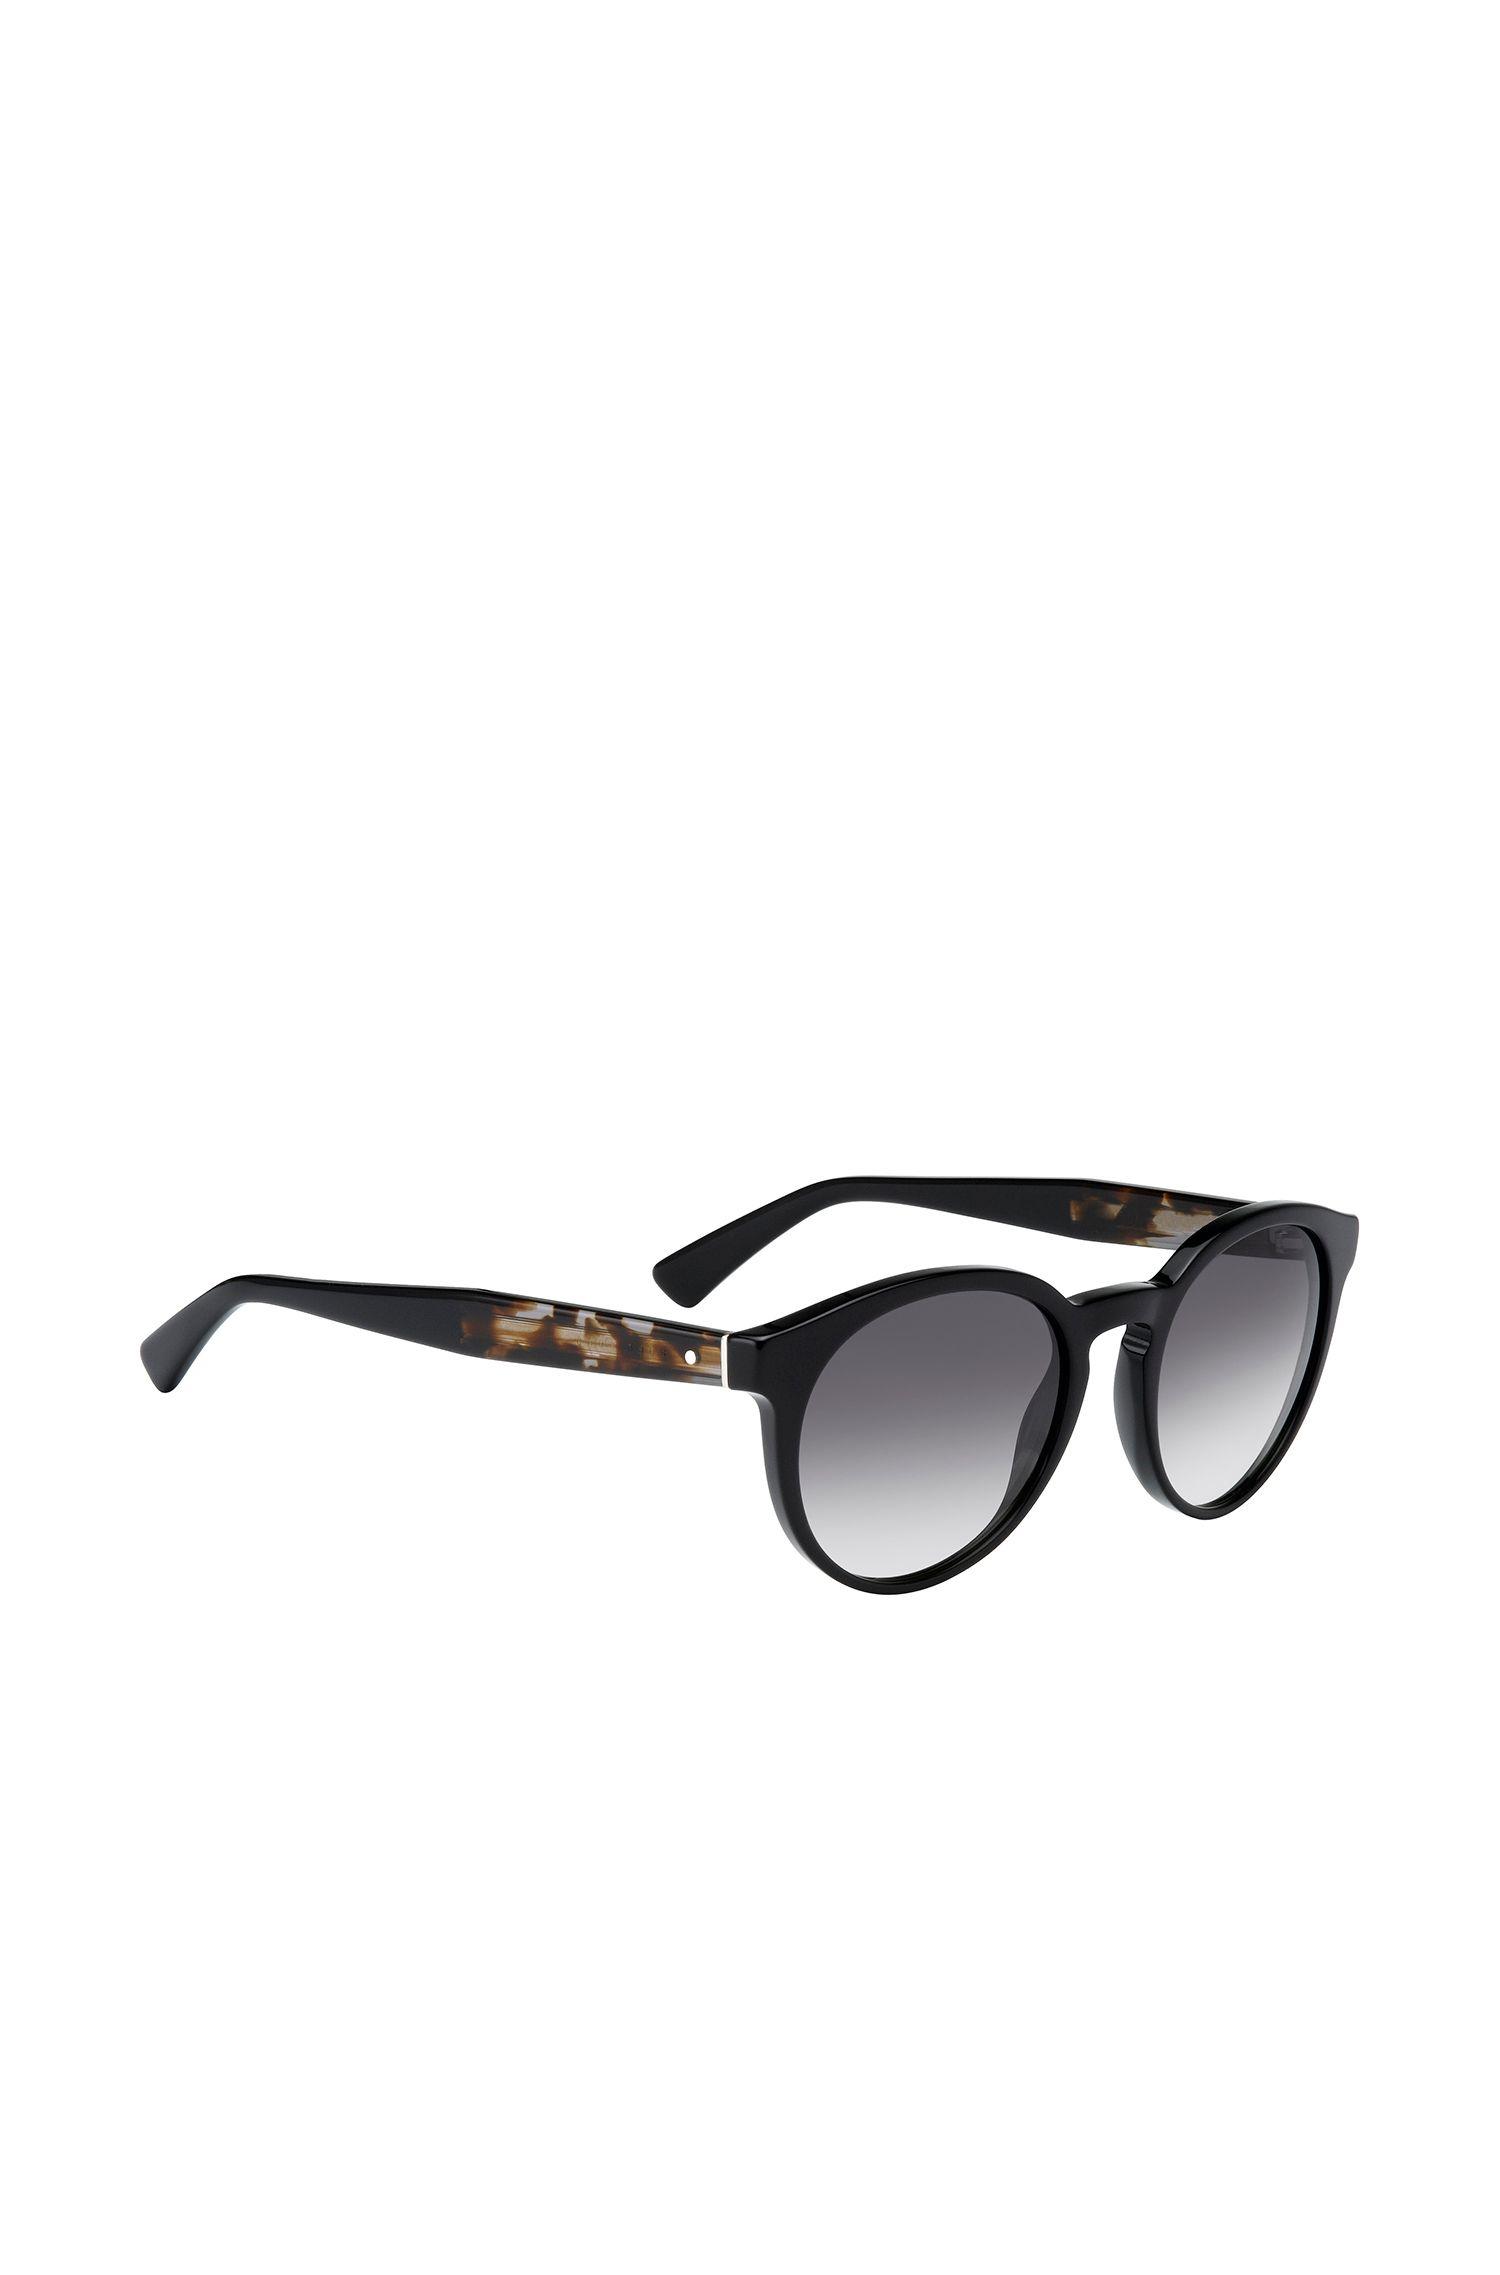 Schwarze Sonnenbrille im Panto-Stil: 'BOSS 0794/S'